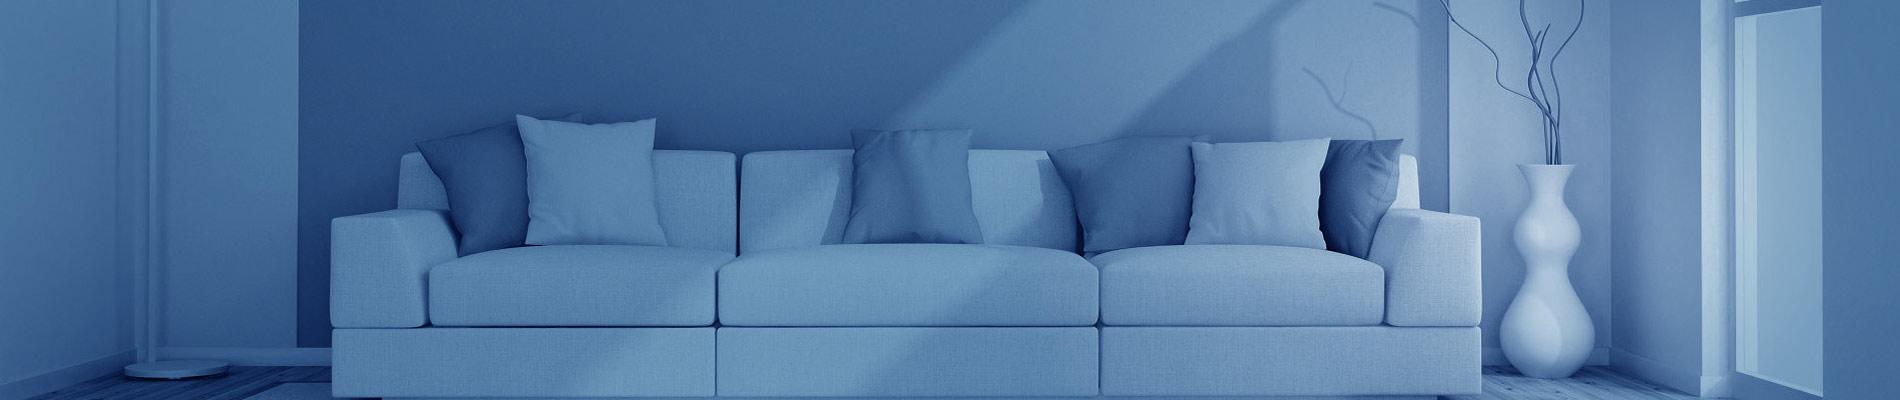 Furniture Modeling for California Based Interior Design and Branding Firm